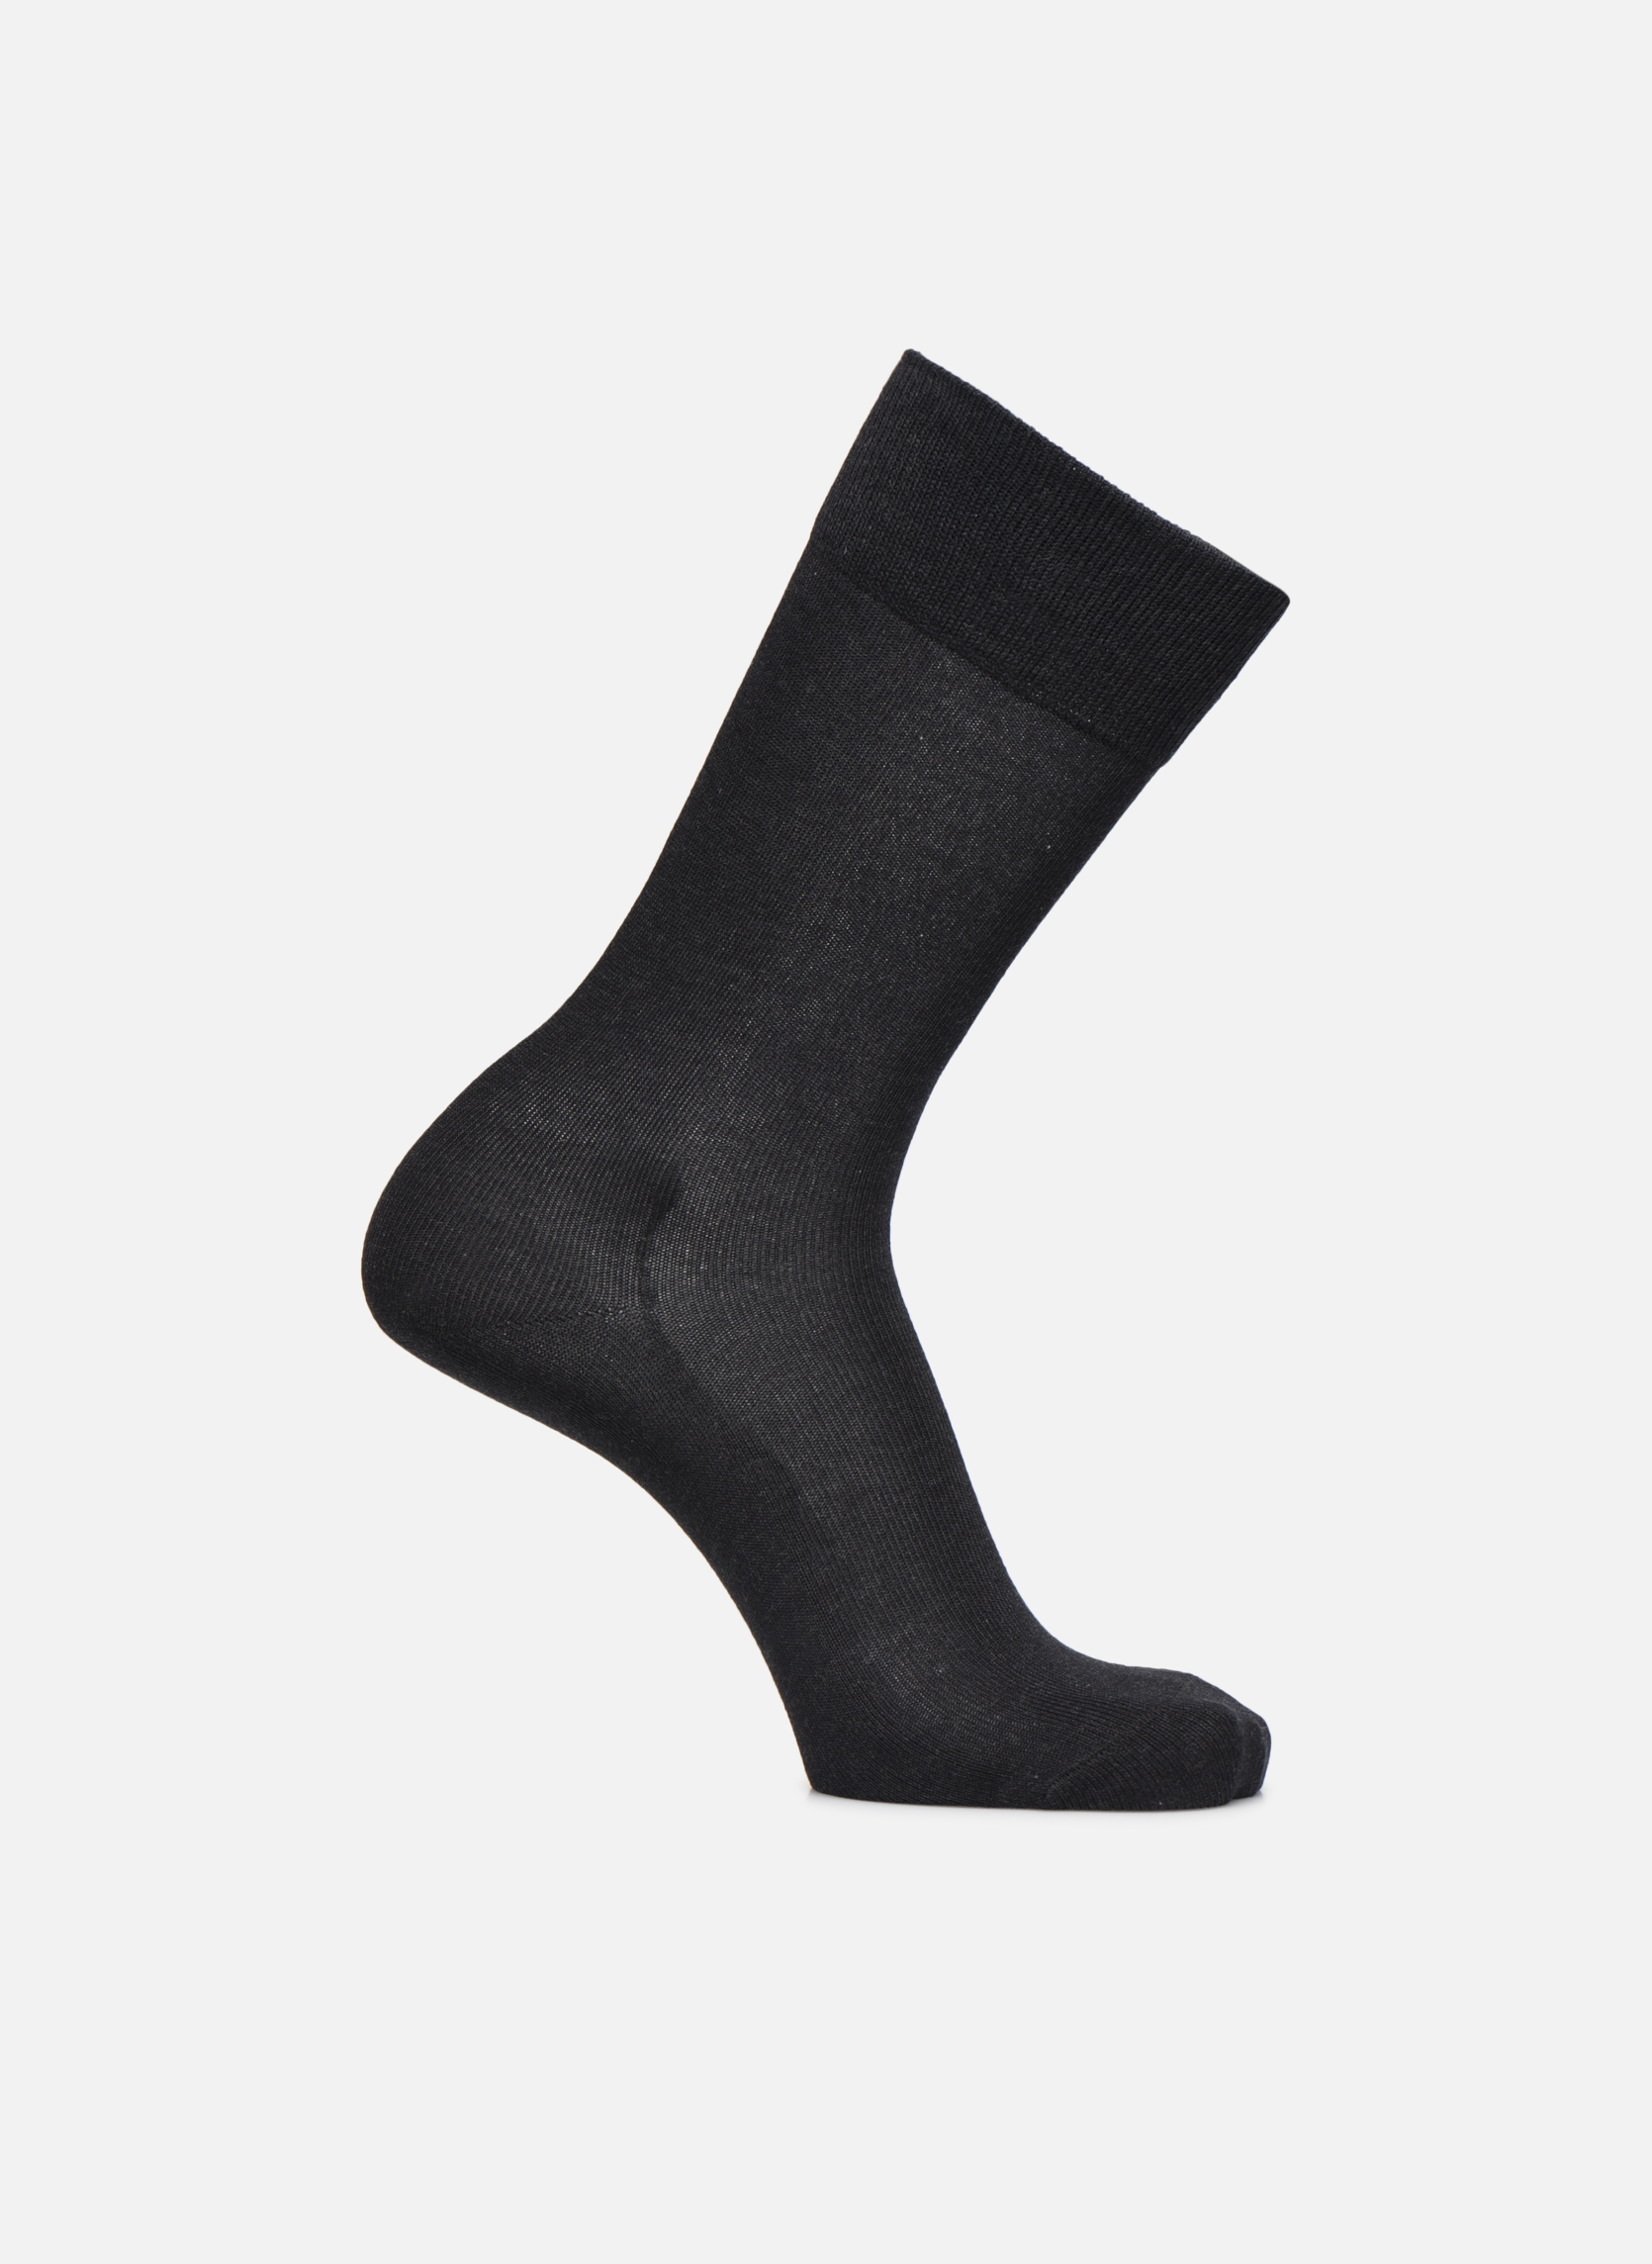 Socks & tights Accessories Socks FAMILY